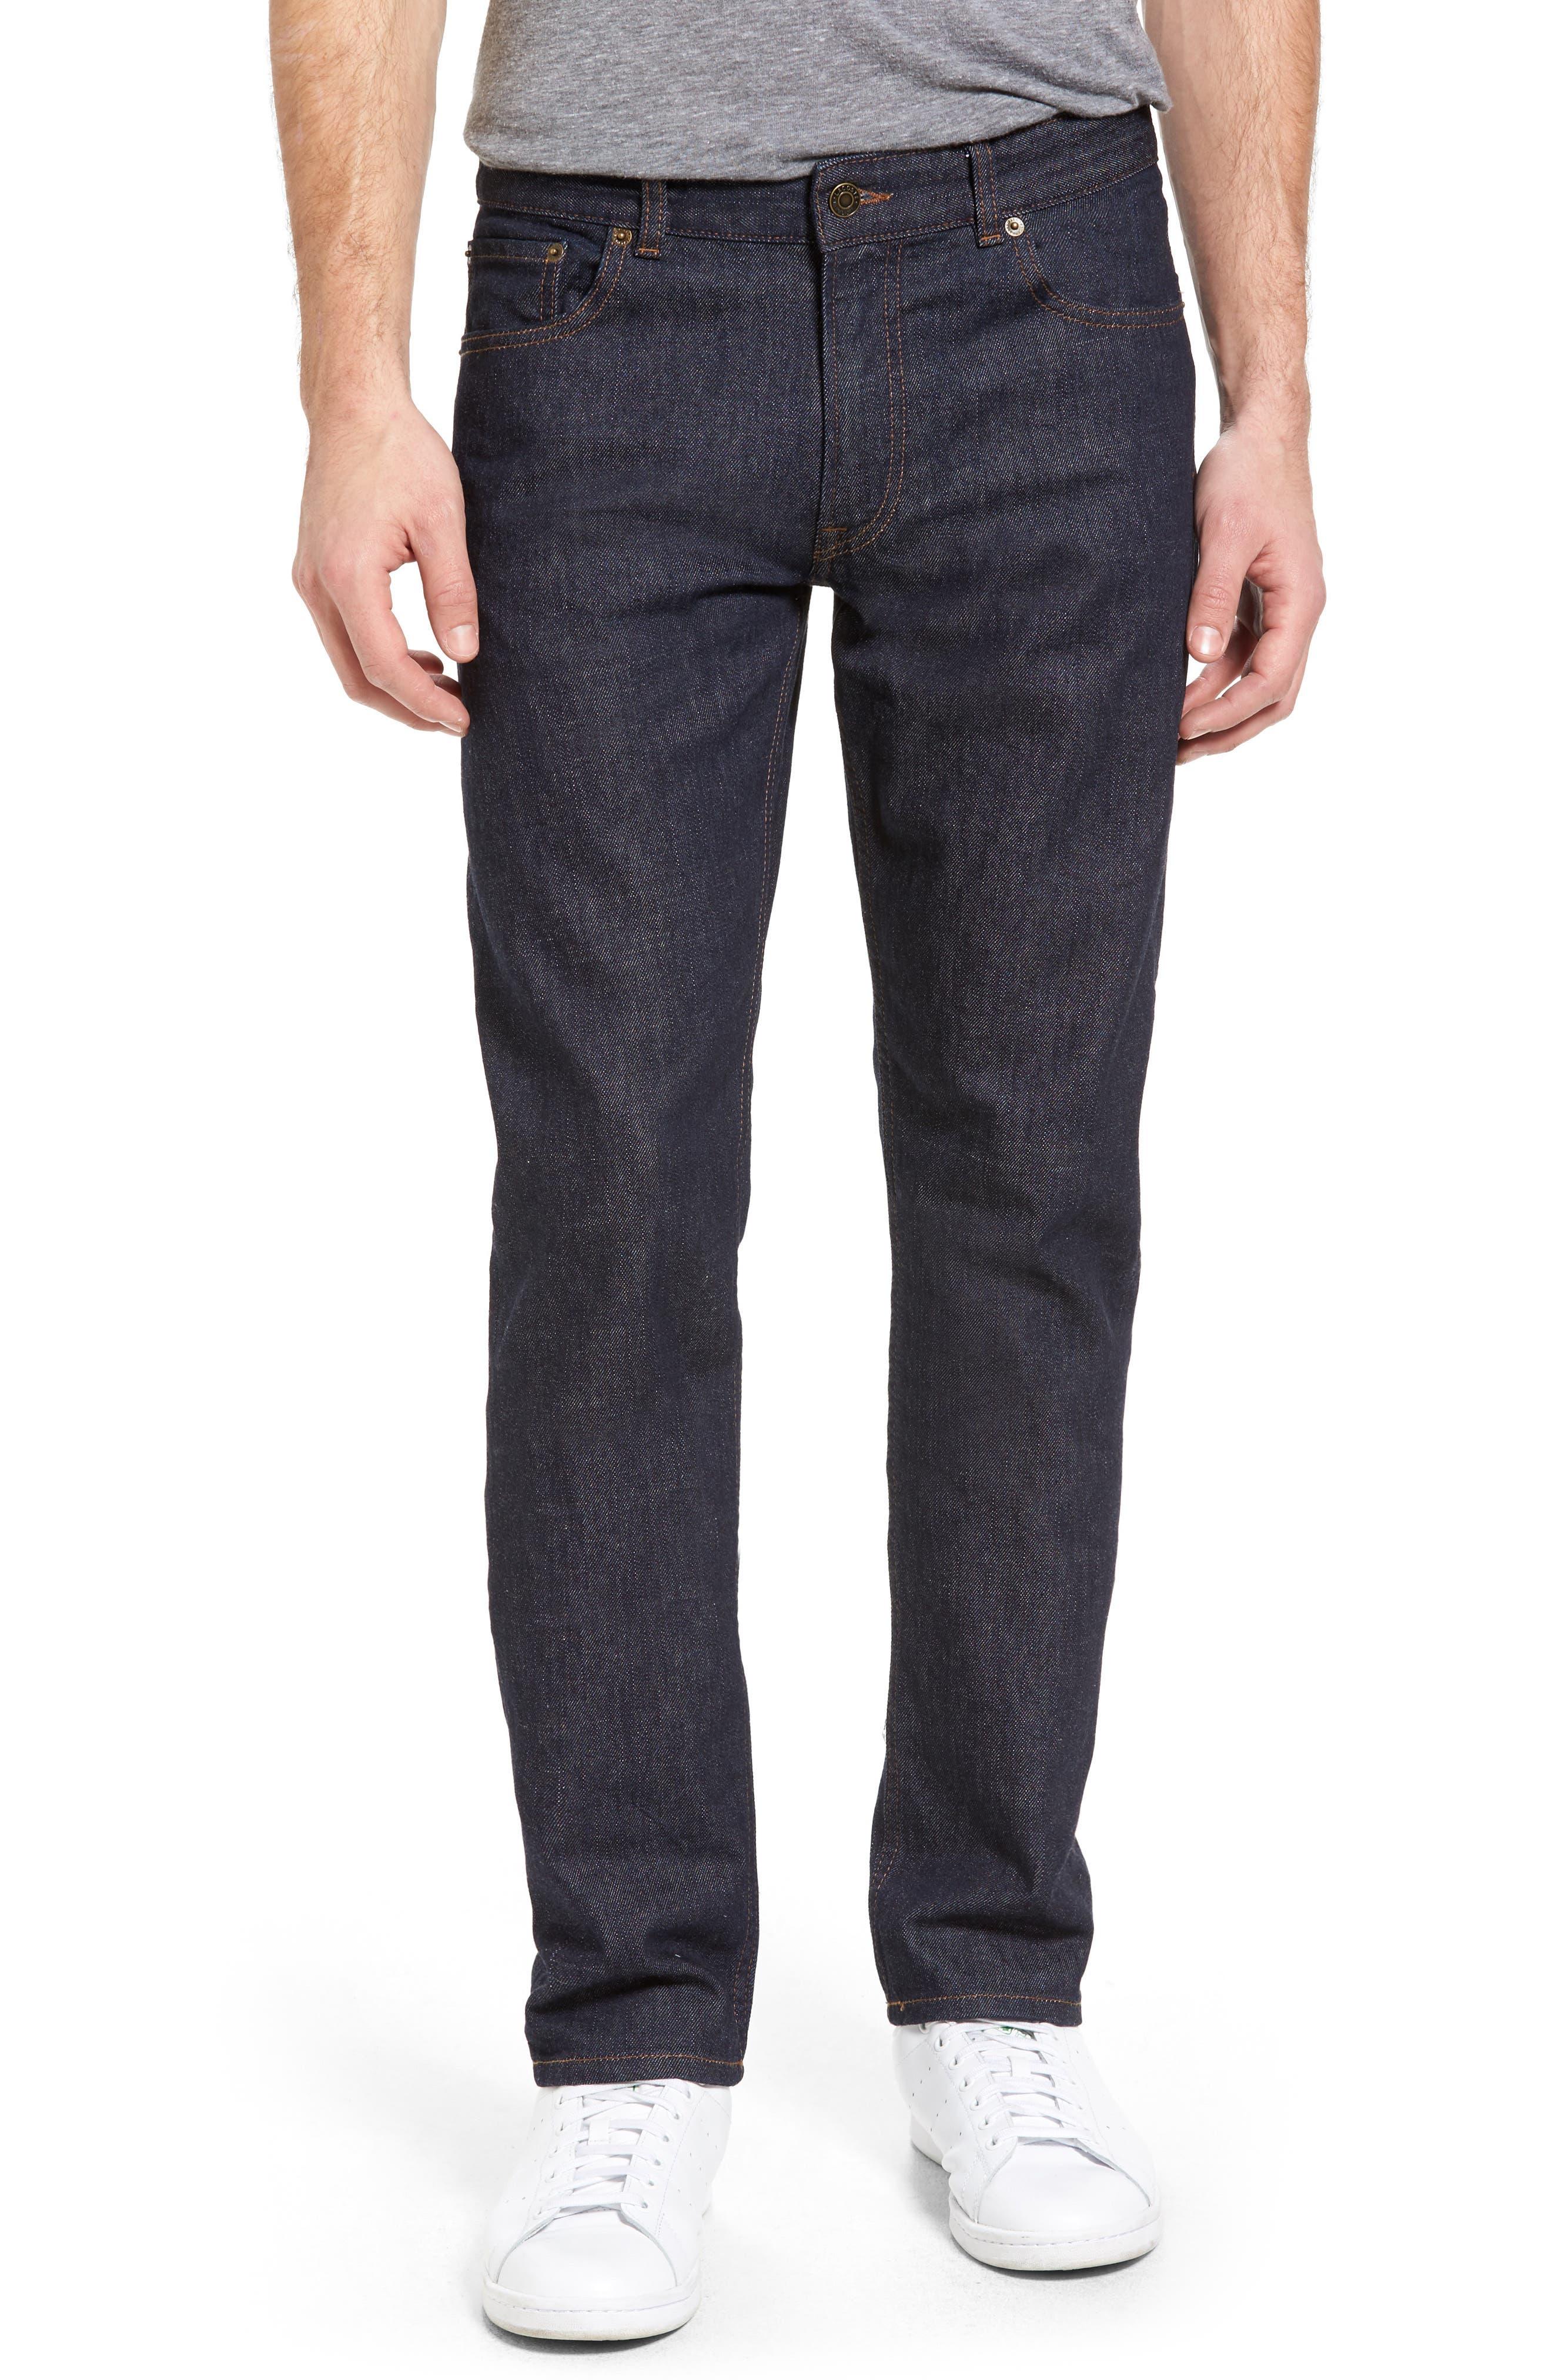 Lacoste Slim Fit Jeans (Light Rinse Blue)